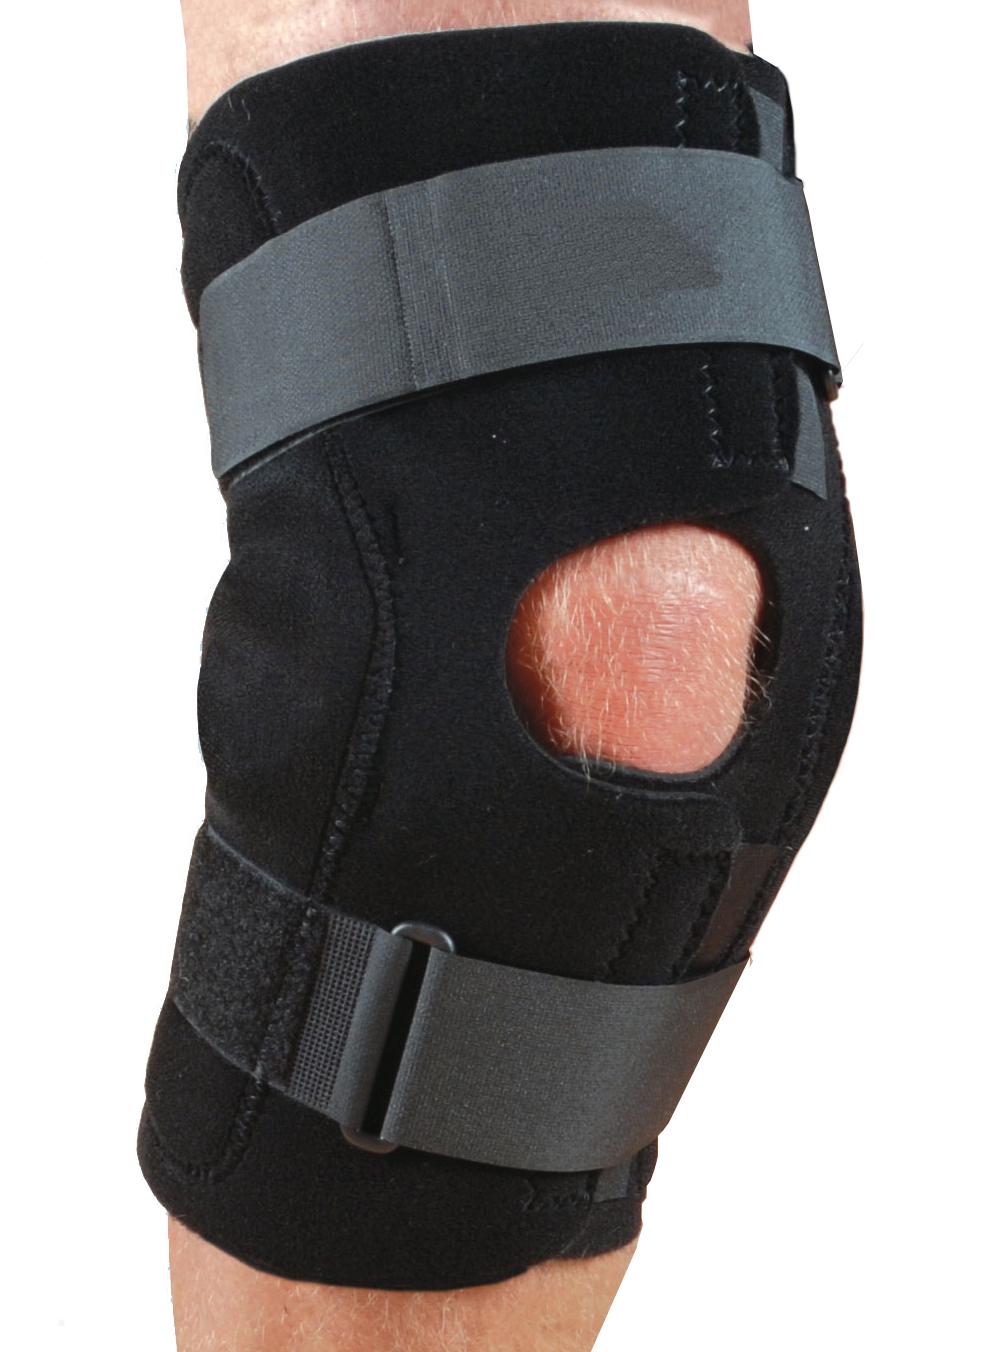 d1251d1efa Hely Weber Knapp Hinged Knee Brace | Carolina Sports & Ortho ...